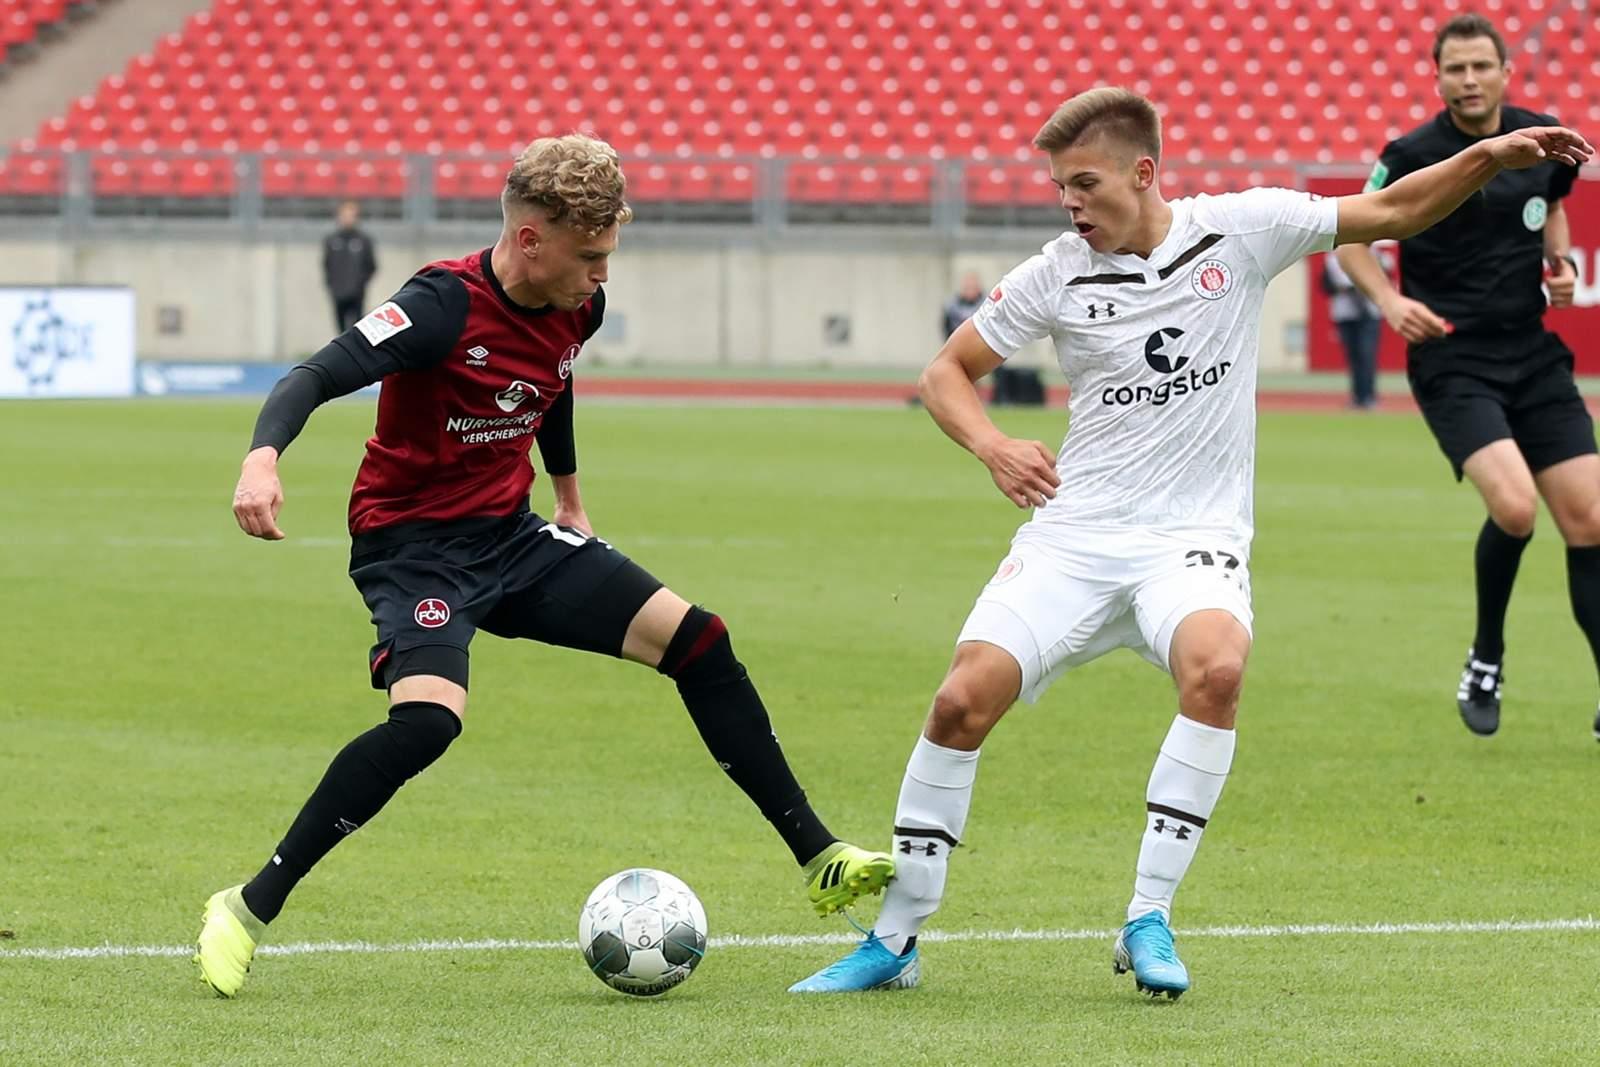 Robin Hack gegen Finn Ole Becker. Jetzt auf FC St. Pauli vs 1. FC Nürnberg wetten